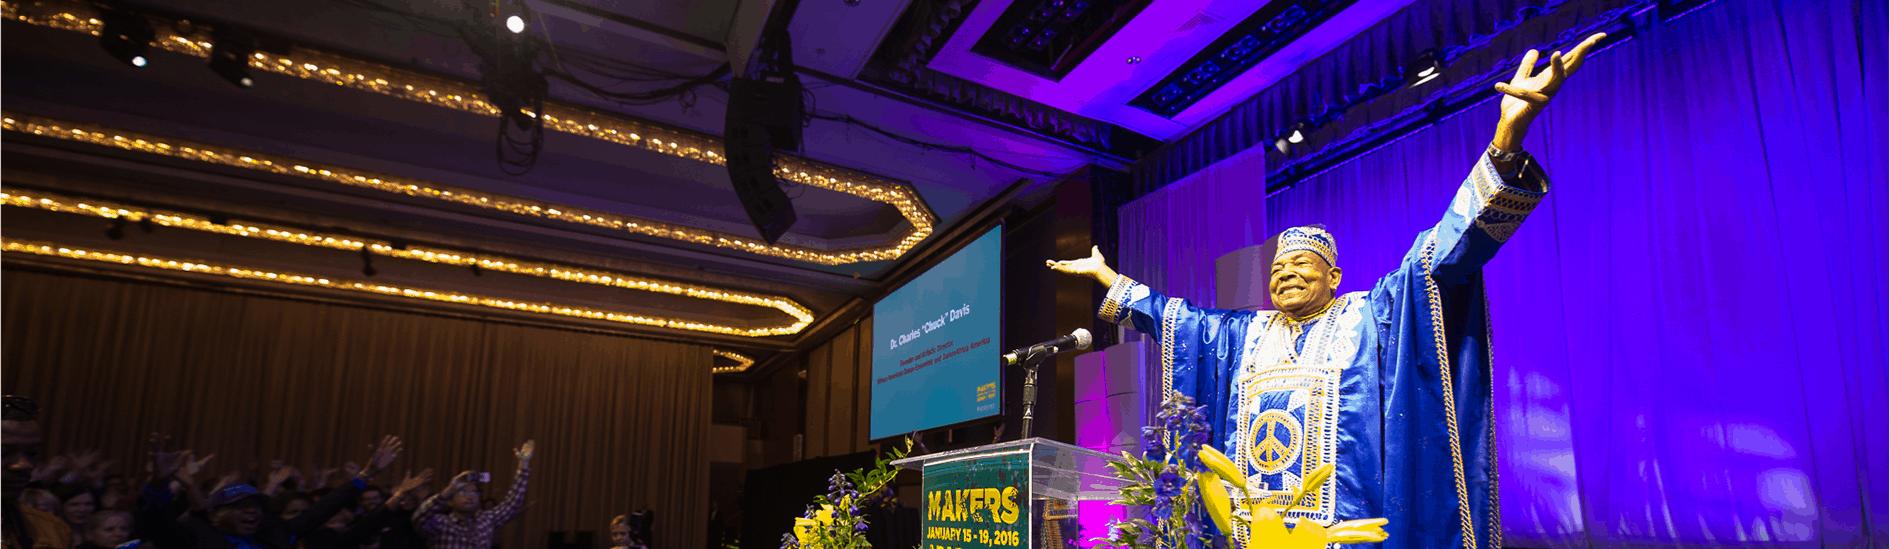 APAPNYC 2017 Awards Ceremony Babba Chuck by Adam Kissick/APAP